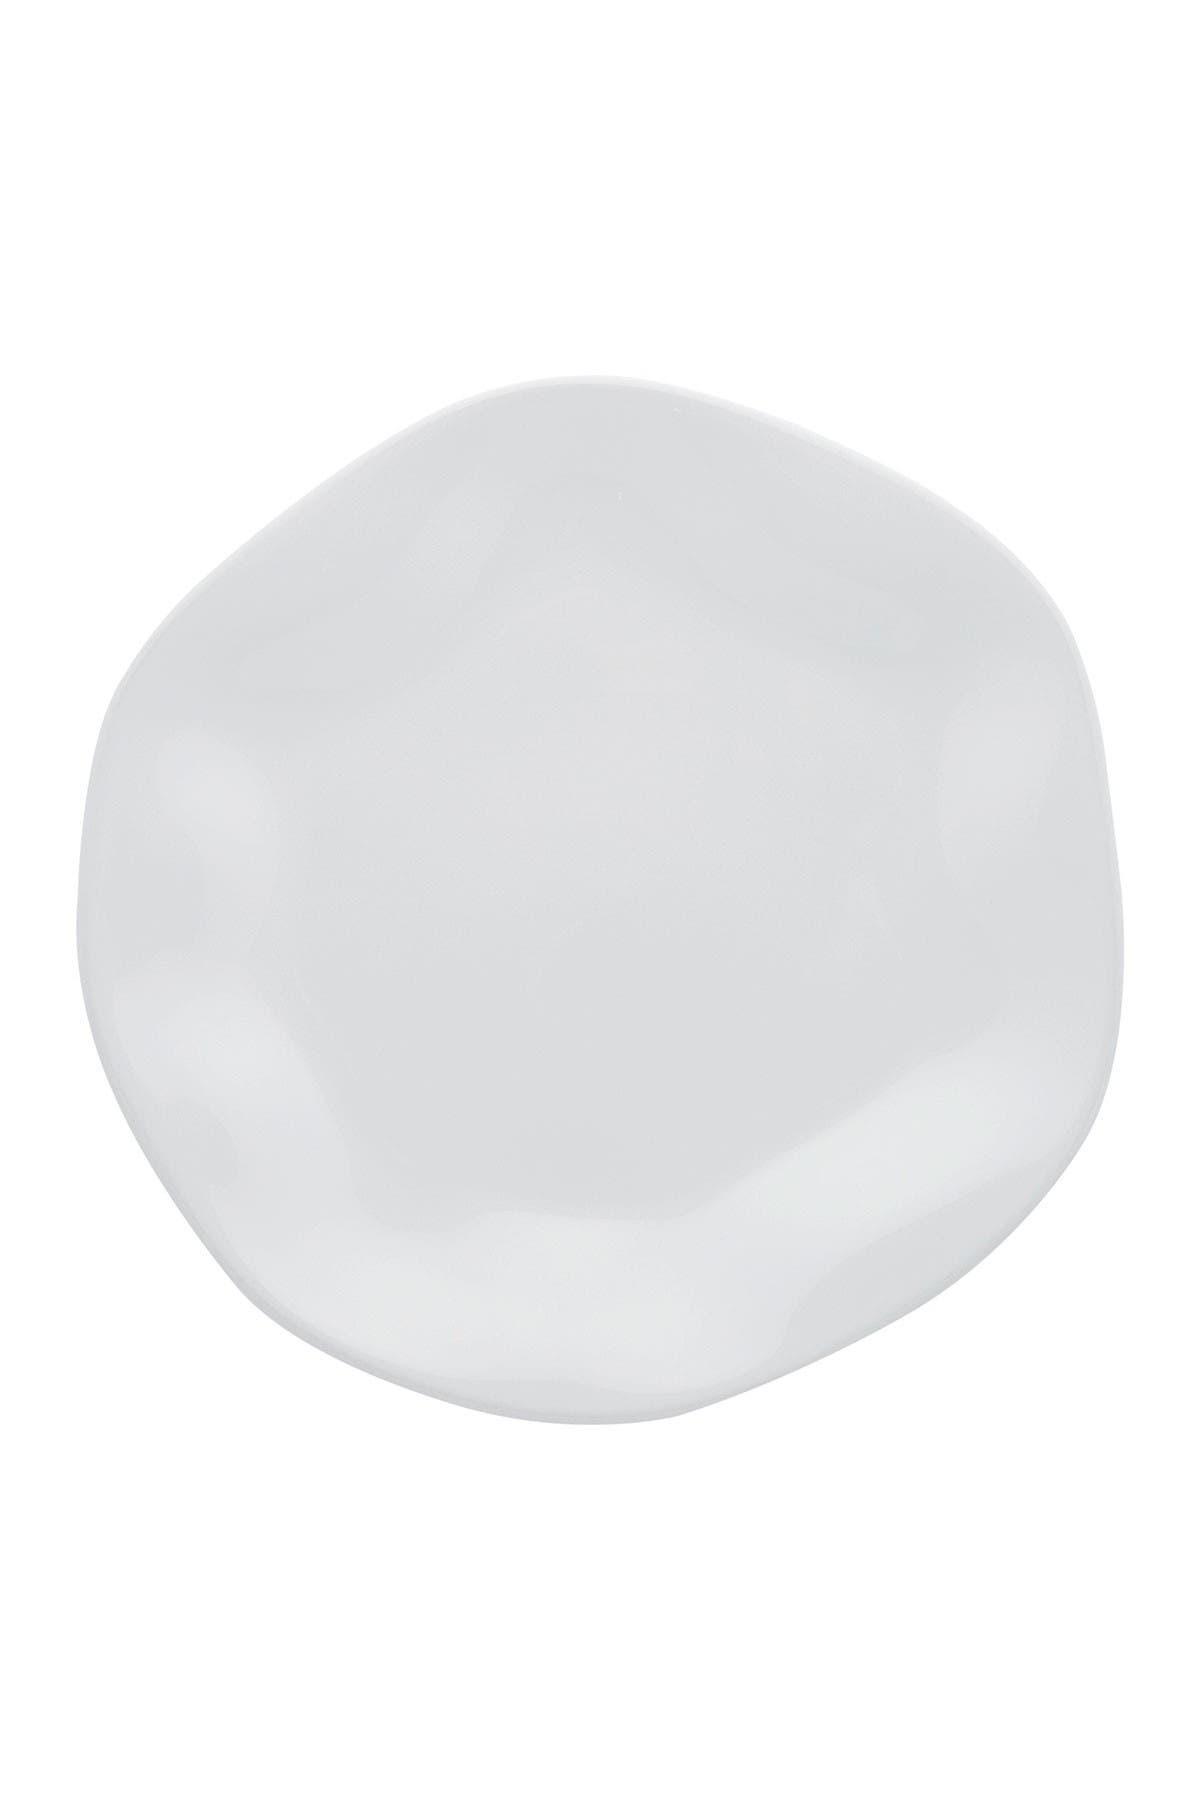 "Image of Manhattan Comfort RYO 6 Medium 8.46"" Salad Plates - White"